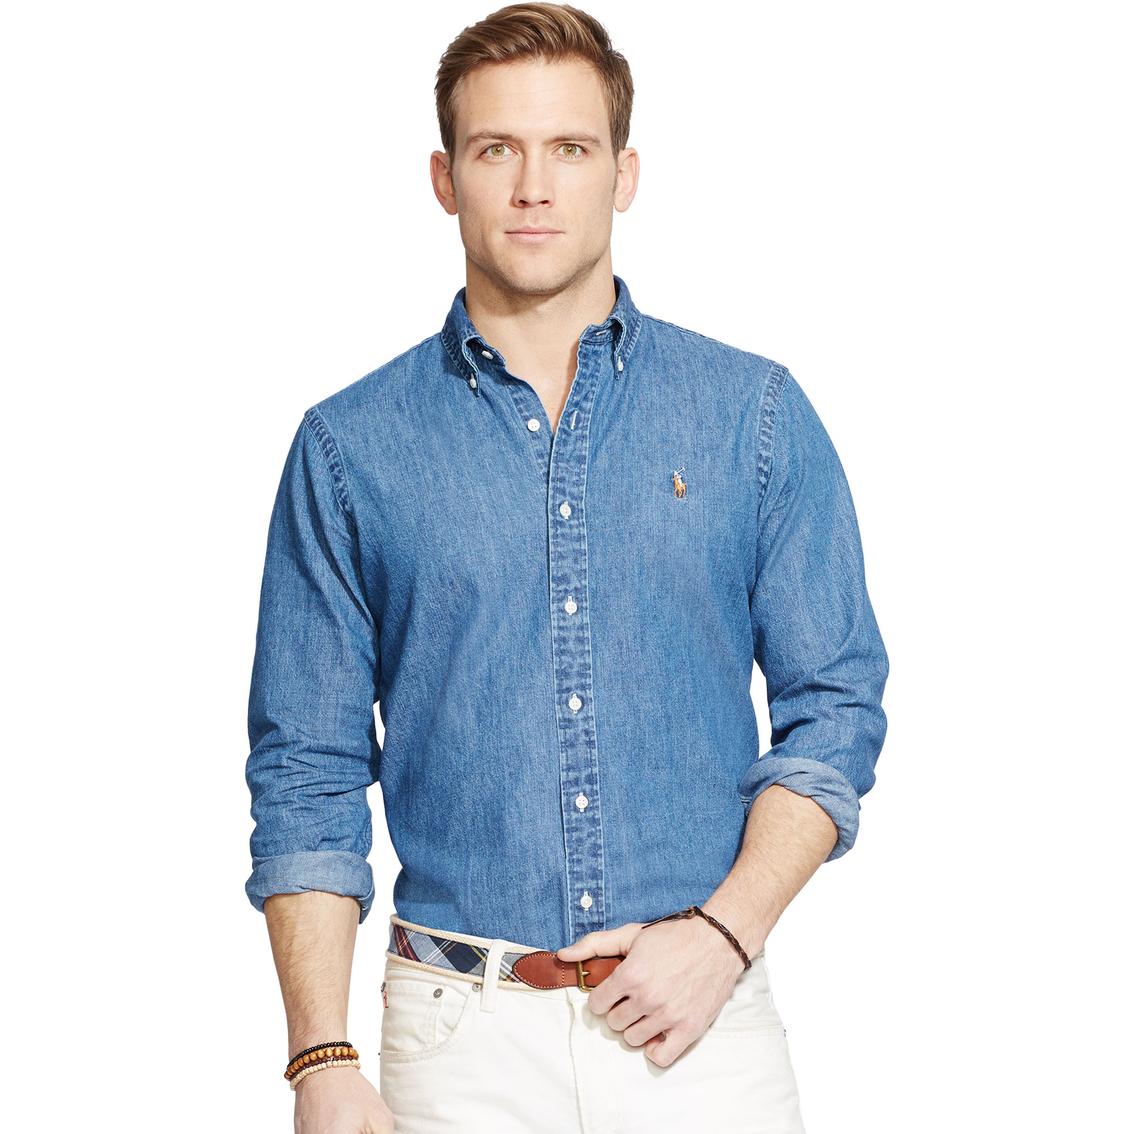 7f451c49 Polo Ralph Lauren Classic Fit Denim Shirt | Polo Ralph Lauren | Shop ...